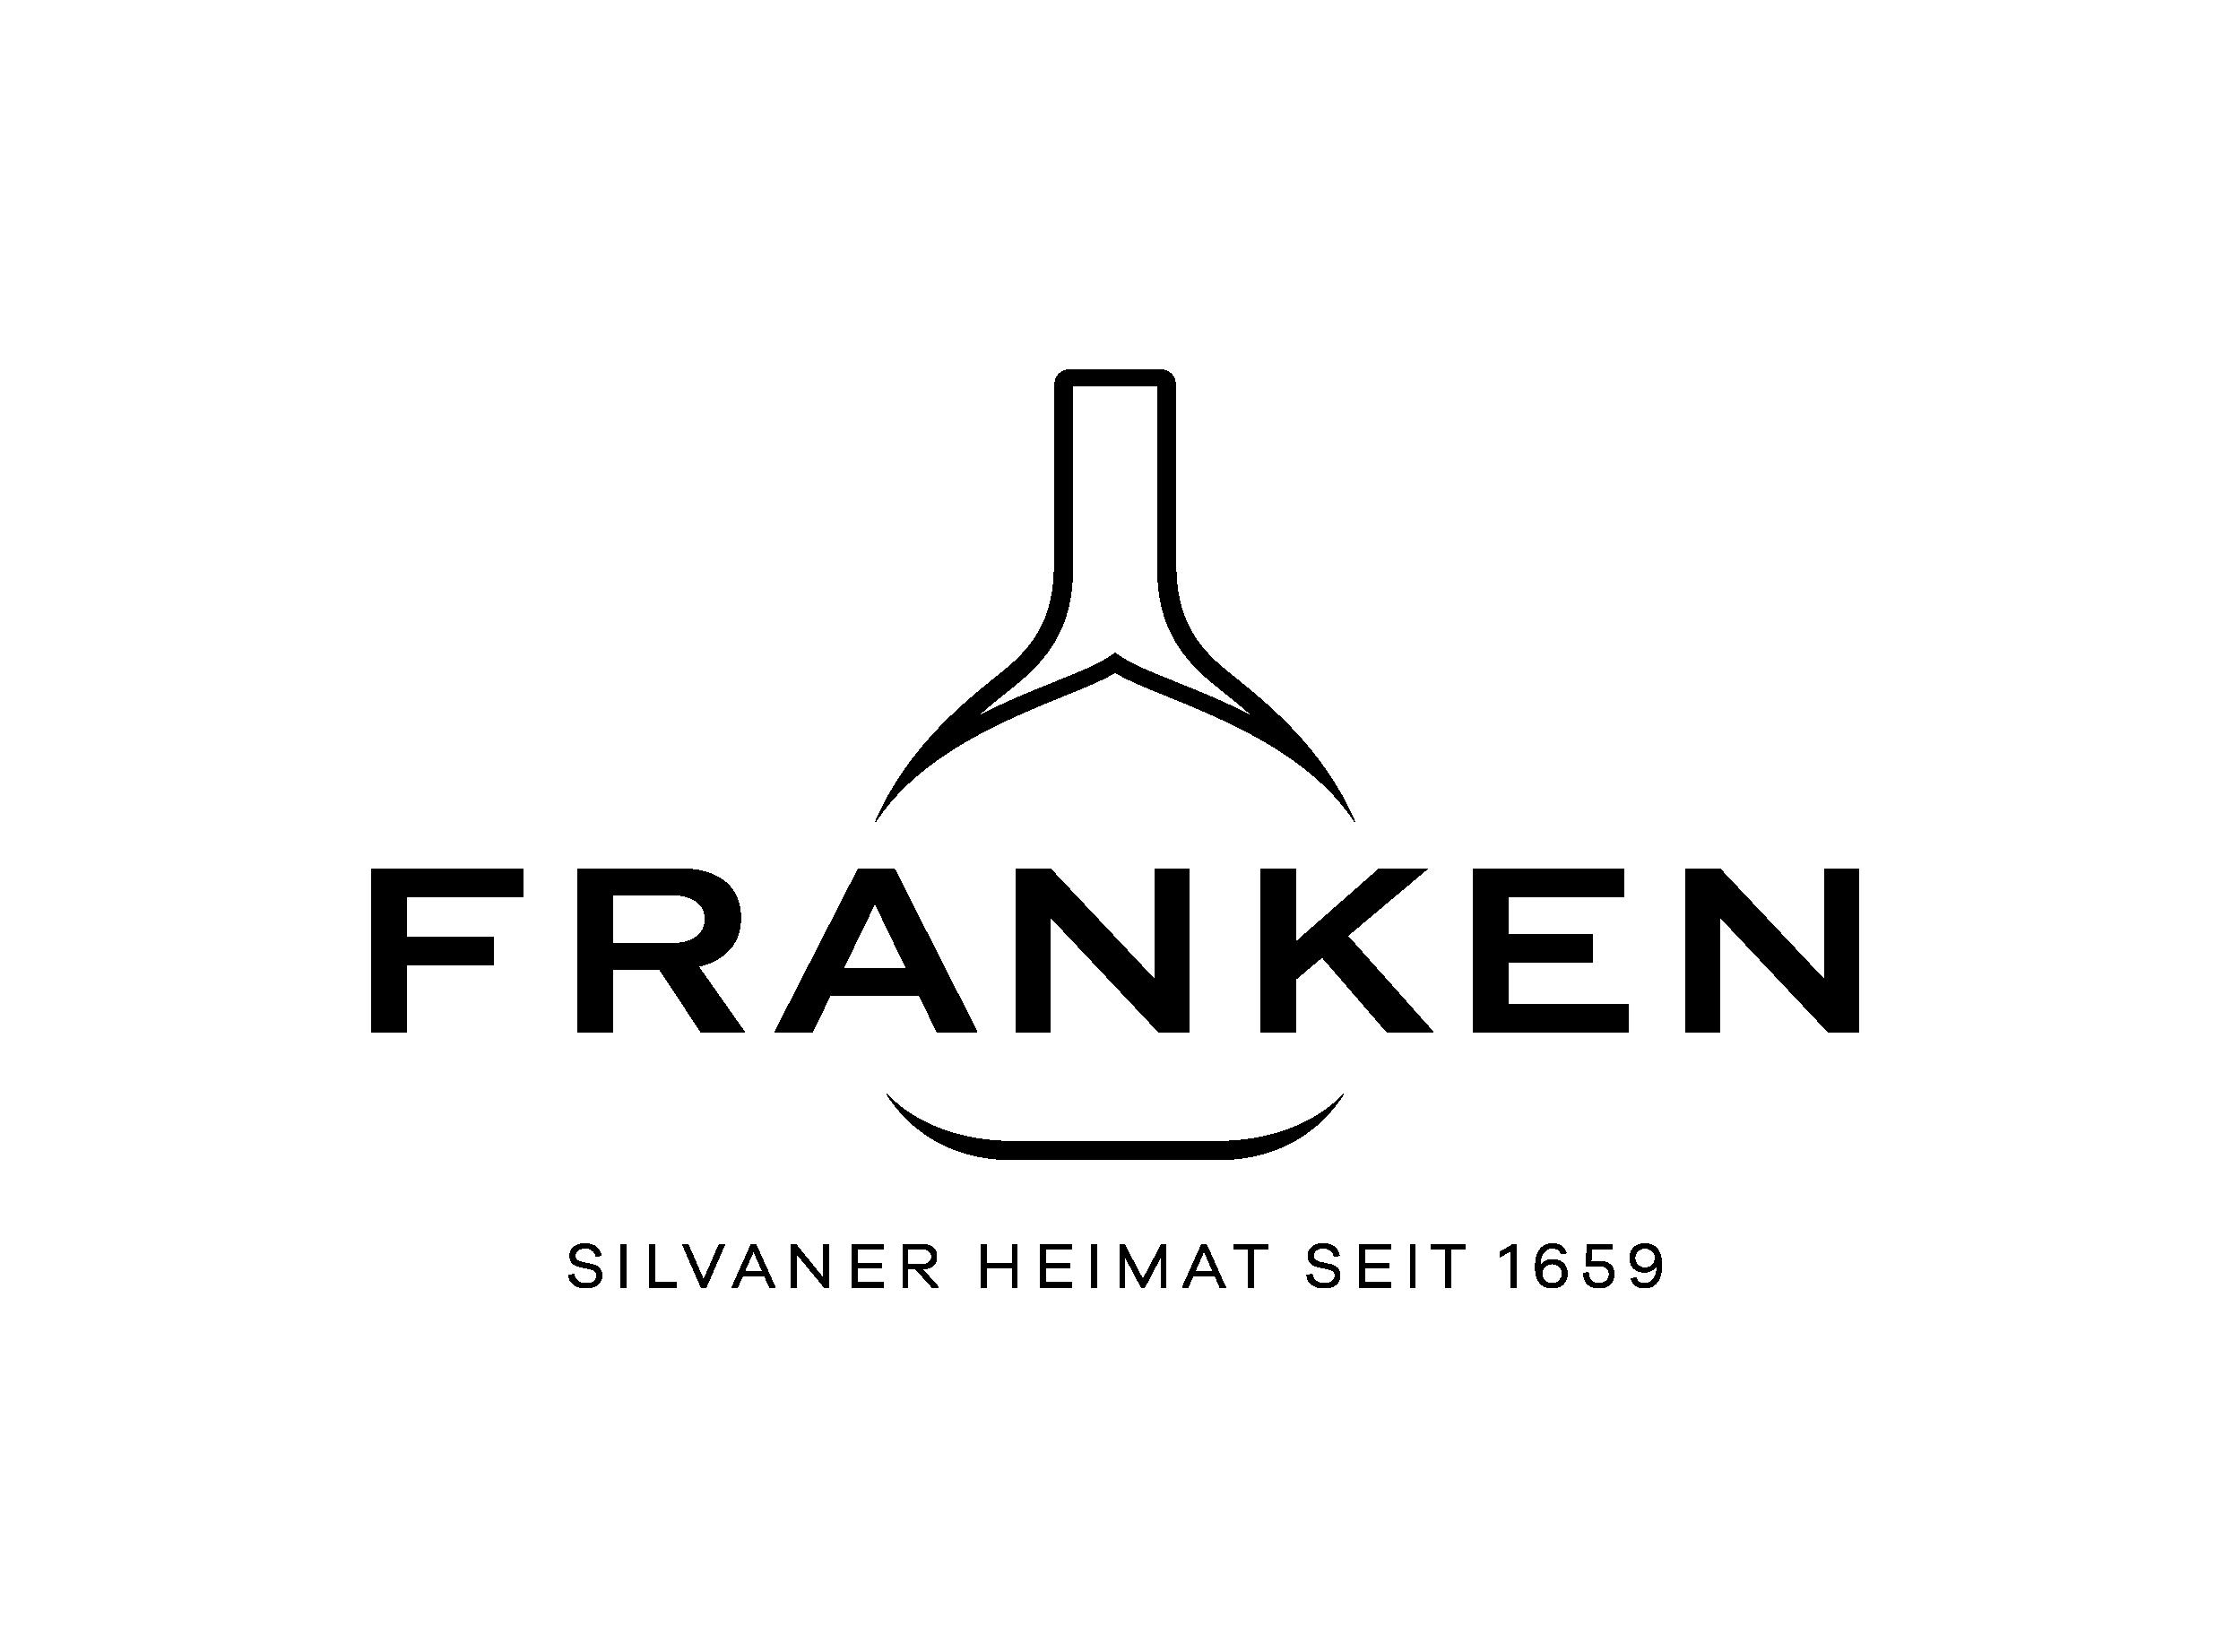 Franken_Logo_positiv_ohneHintergrund_mitClaim_CMYK_300dpi